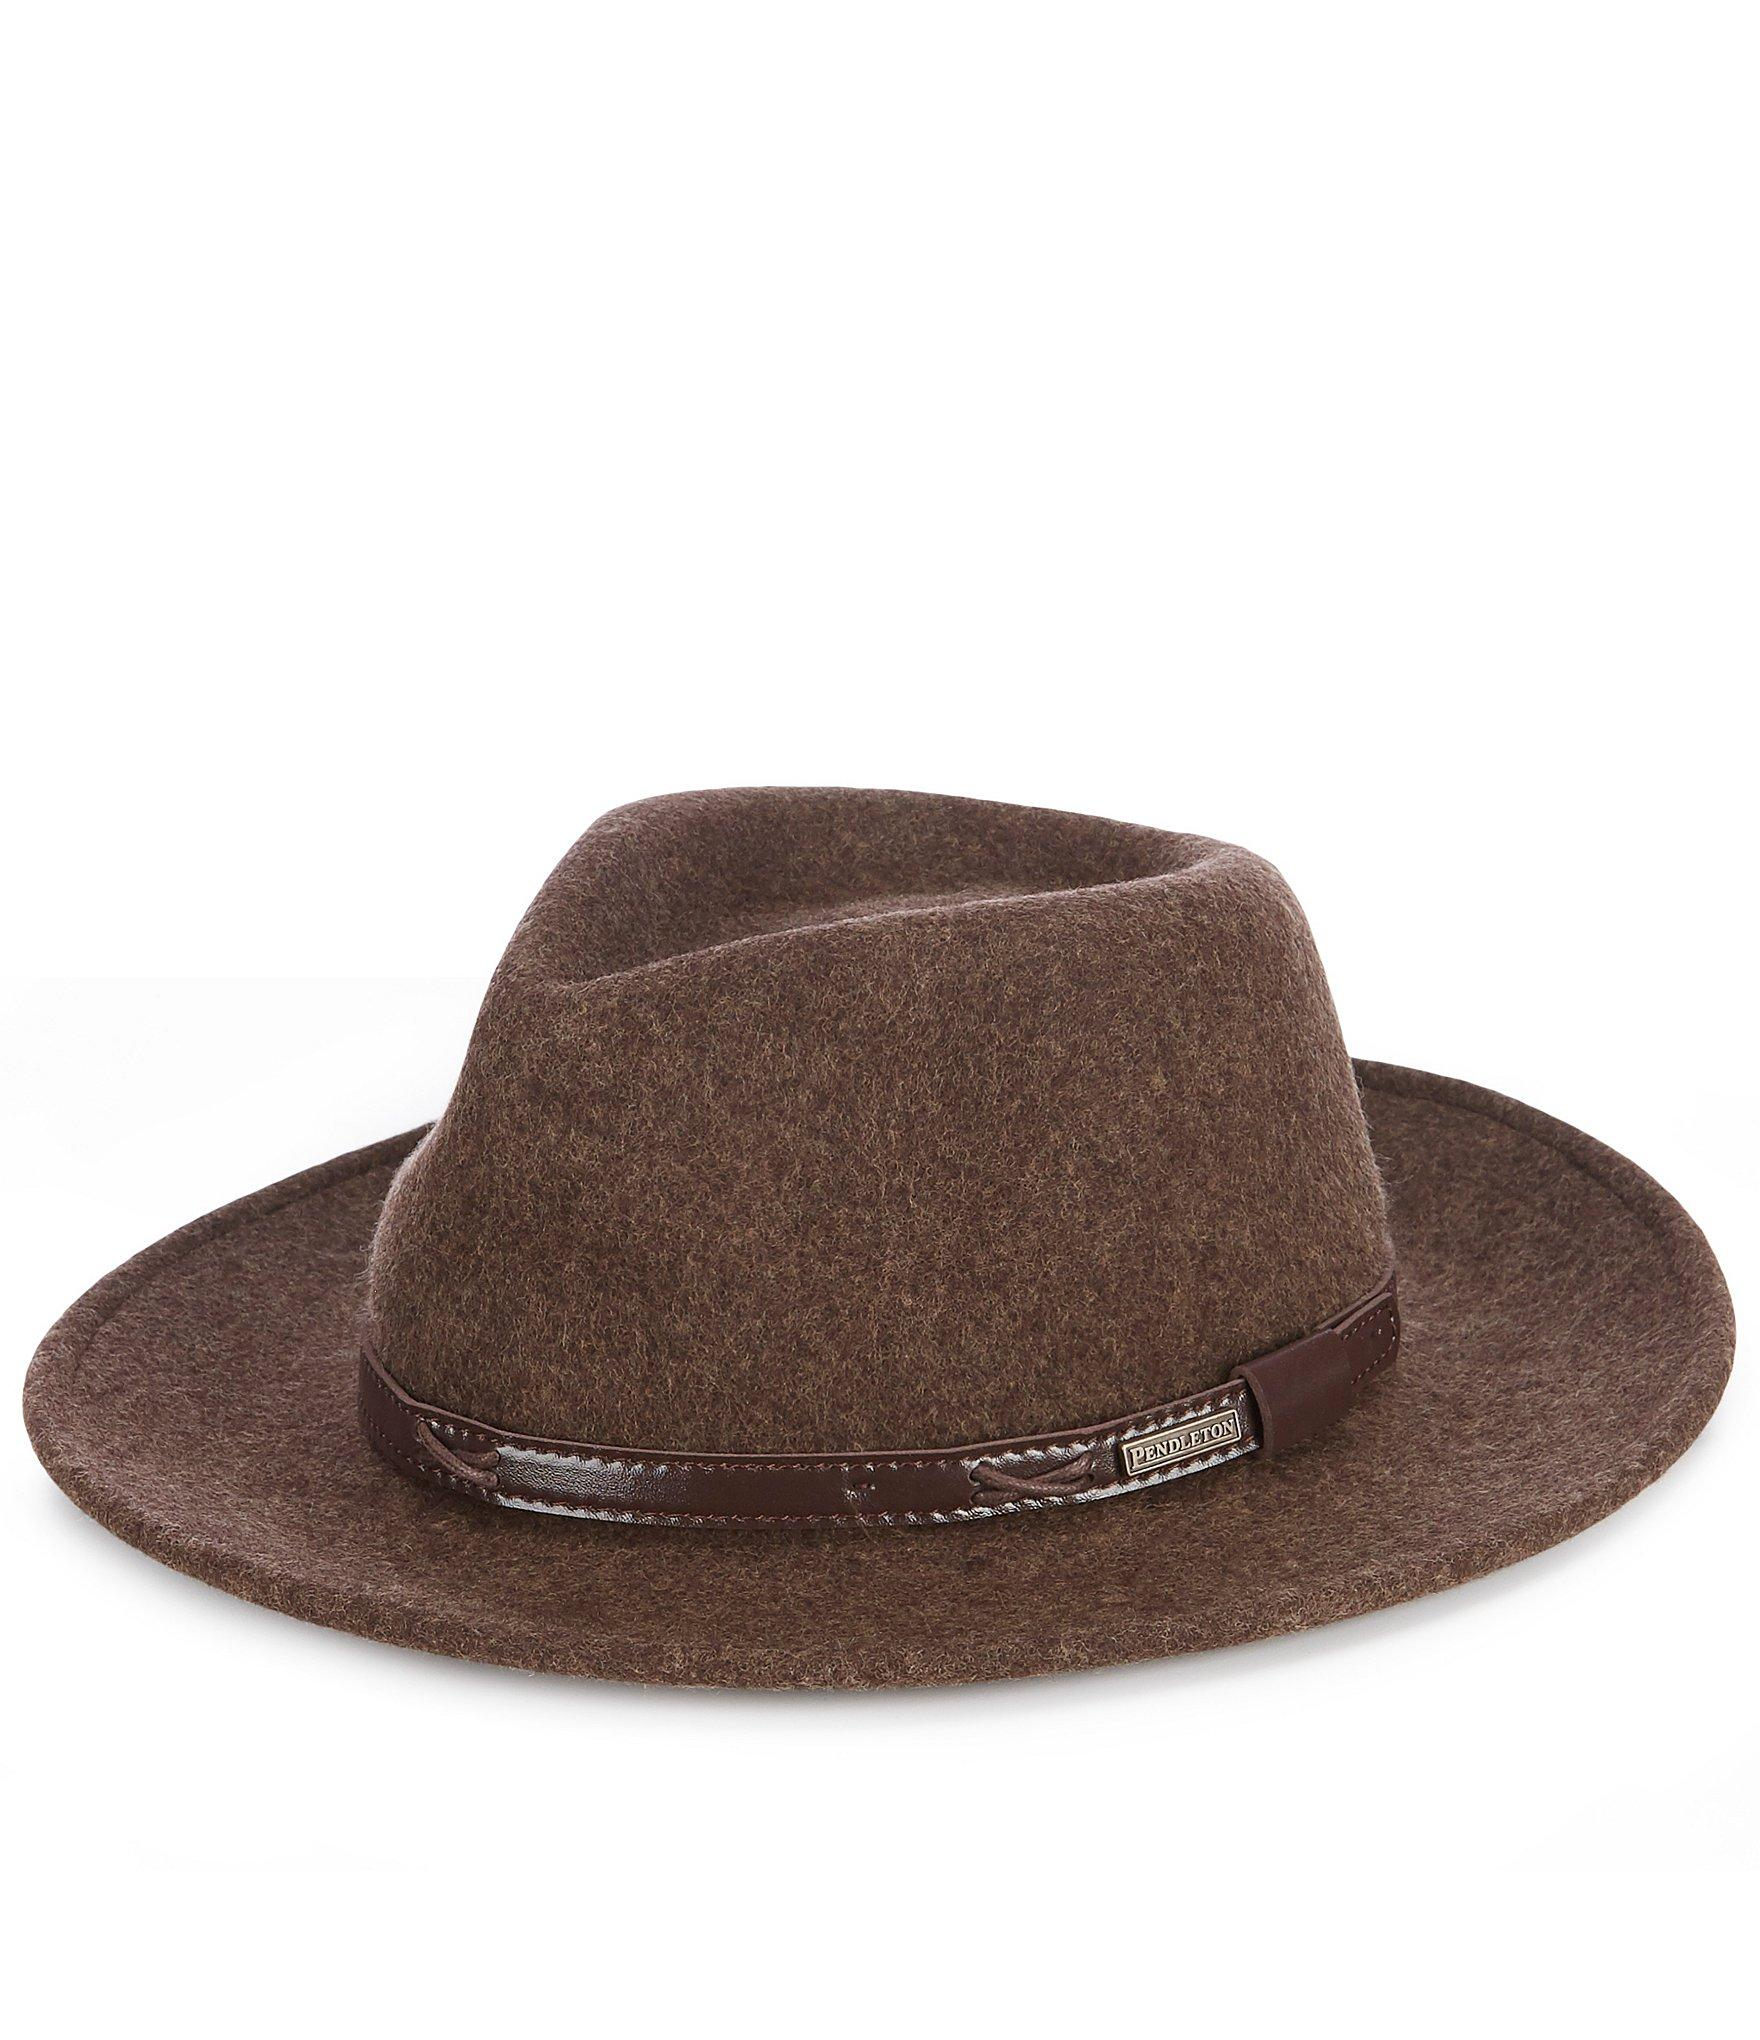 d312bdc179c Pendleton - Green Indiana Jones Water-repellent Wool Felt Hat for Men - Lyst.  View fullscreen